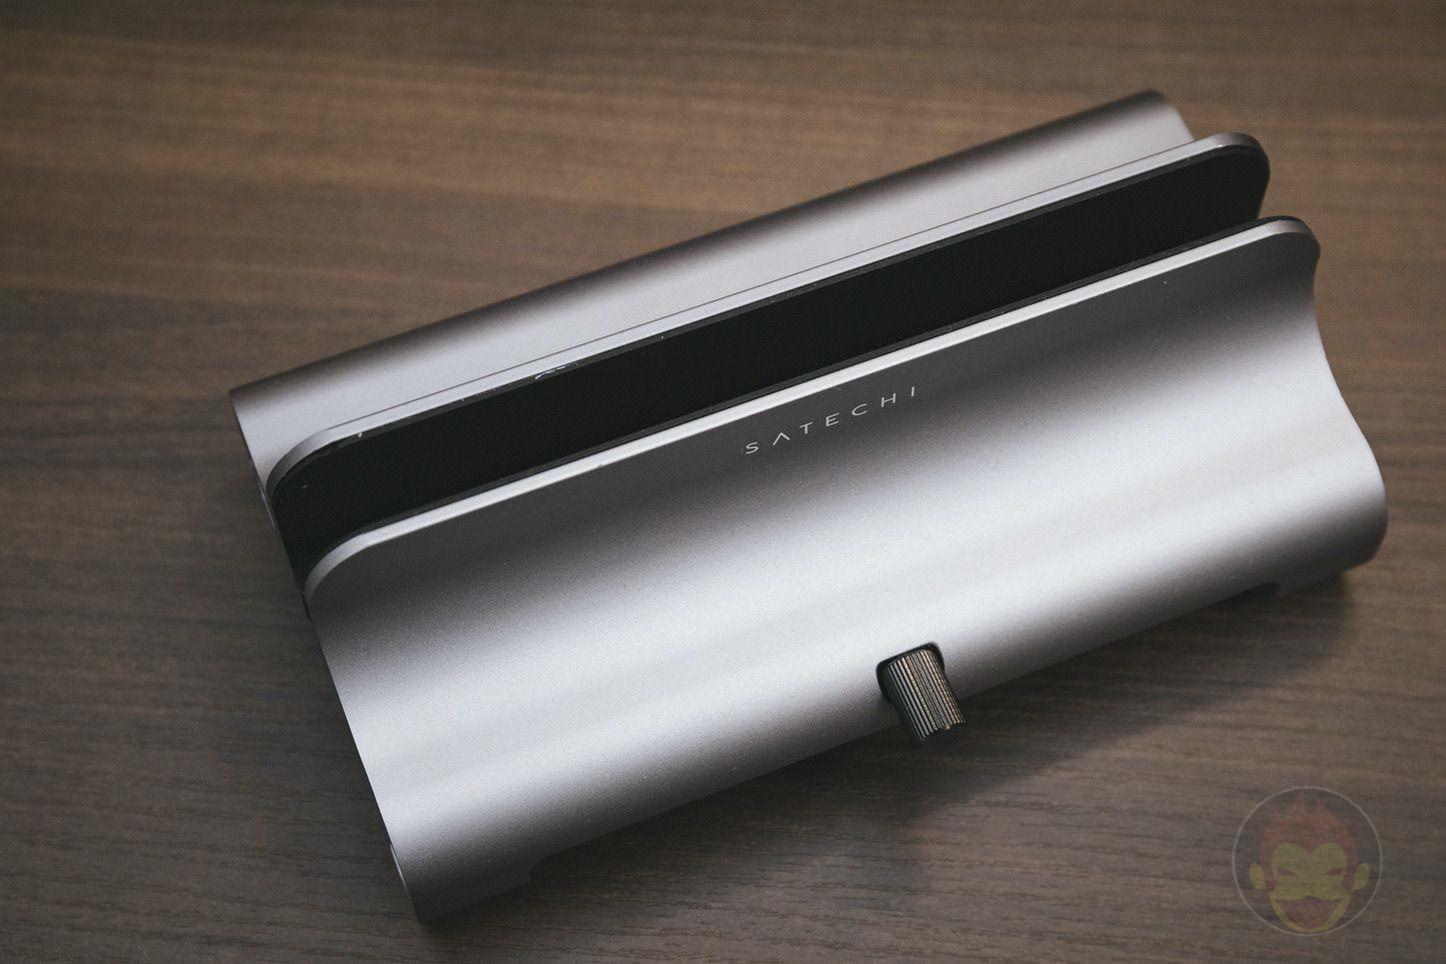 Satechi Universal Aluminum Laptop Stand 01